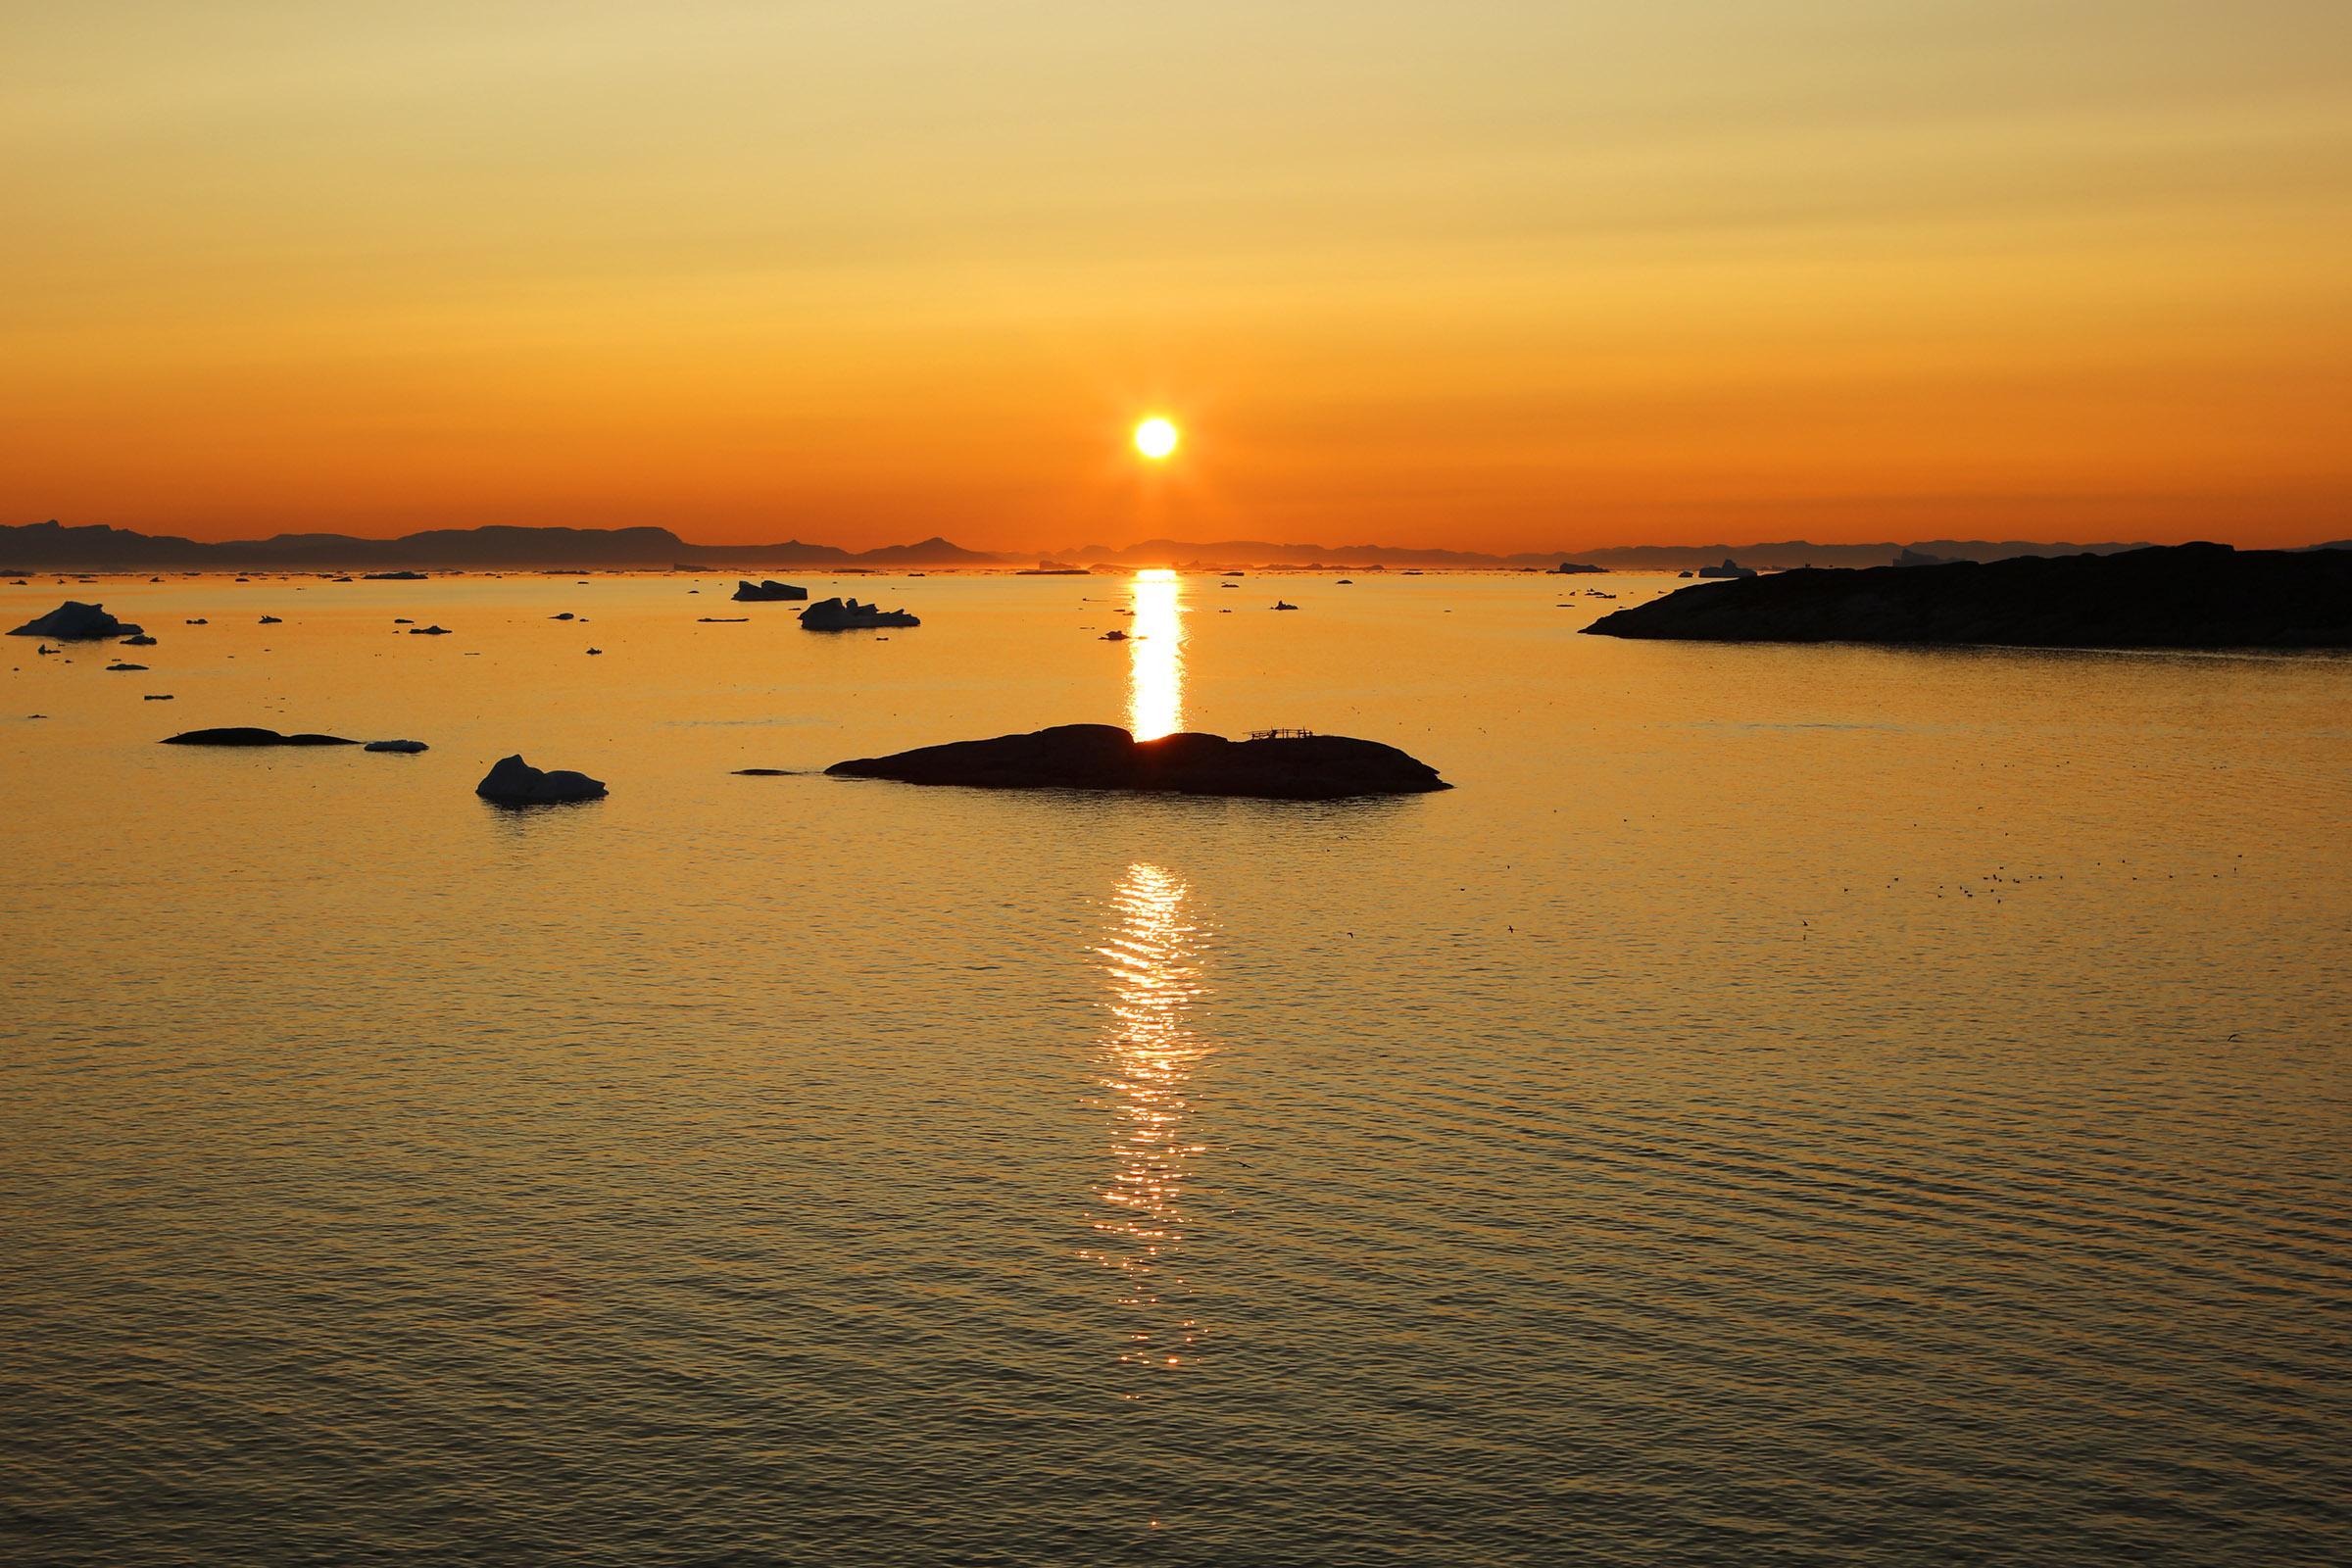 Midnight sun in Greenland. Photo by Jurga Rubinovaite.